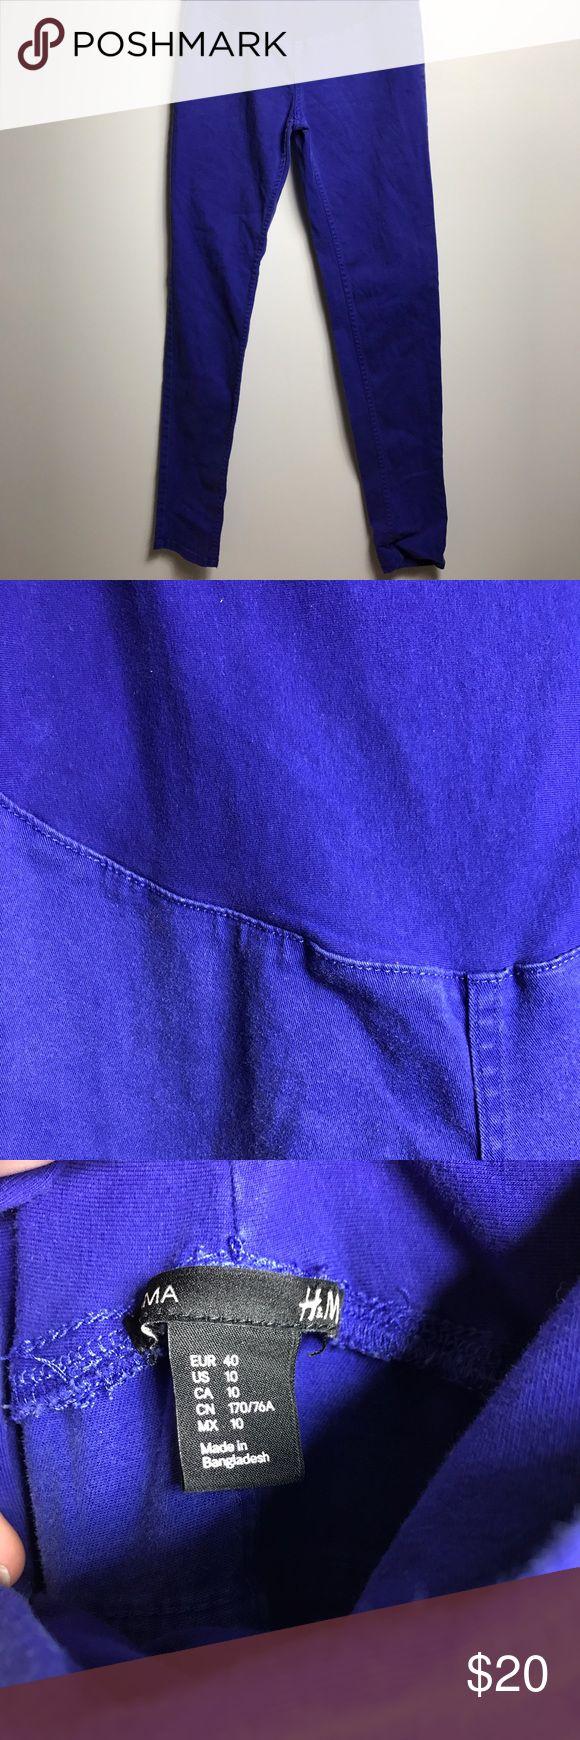 H&M Royal Blue Maternity Skinny Jeans Size 10 Full panel maternity skinny jeans from H&M. No wear or tear. H&M Jeans Skinny